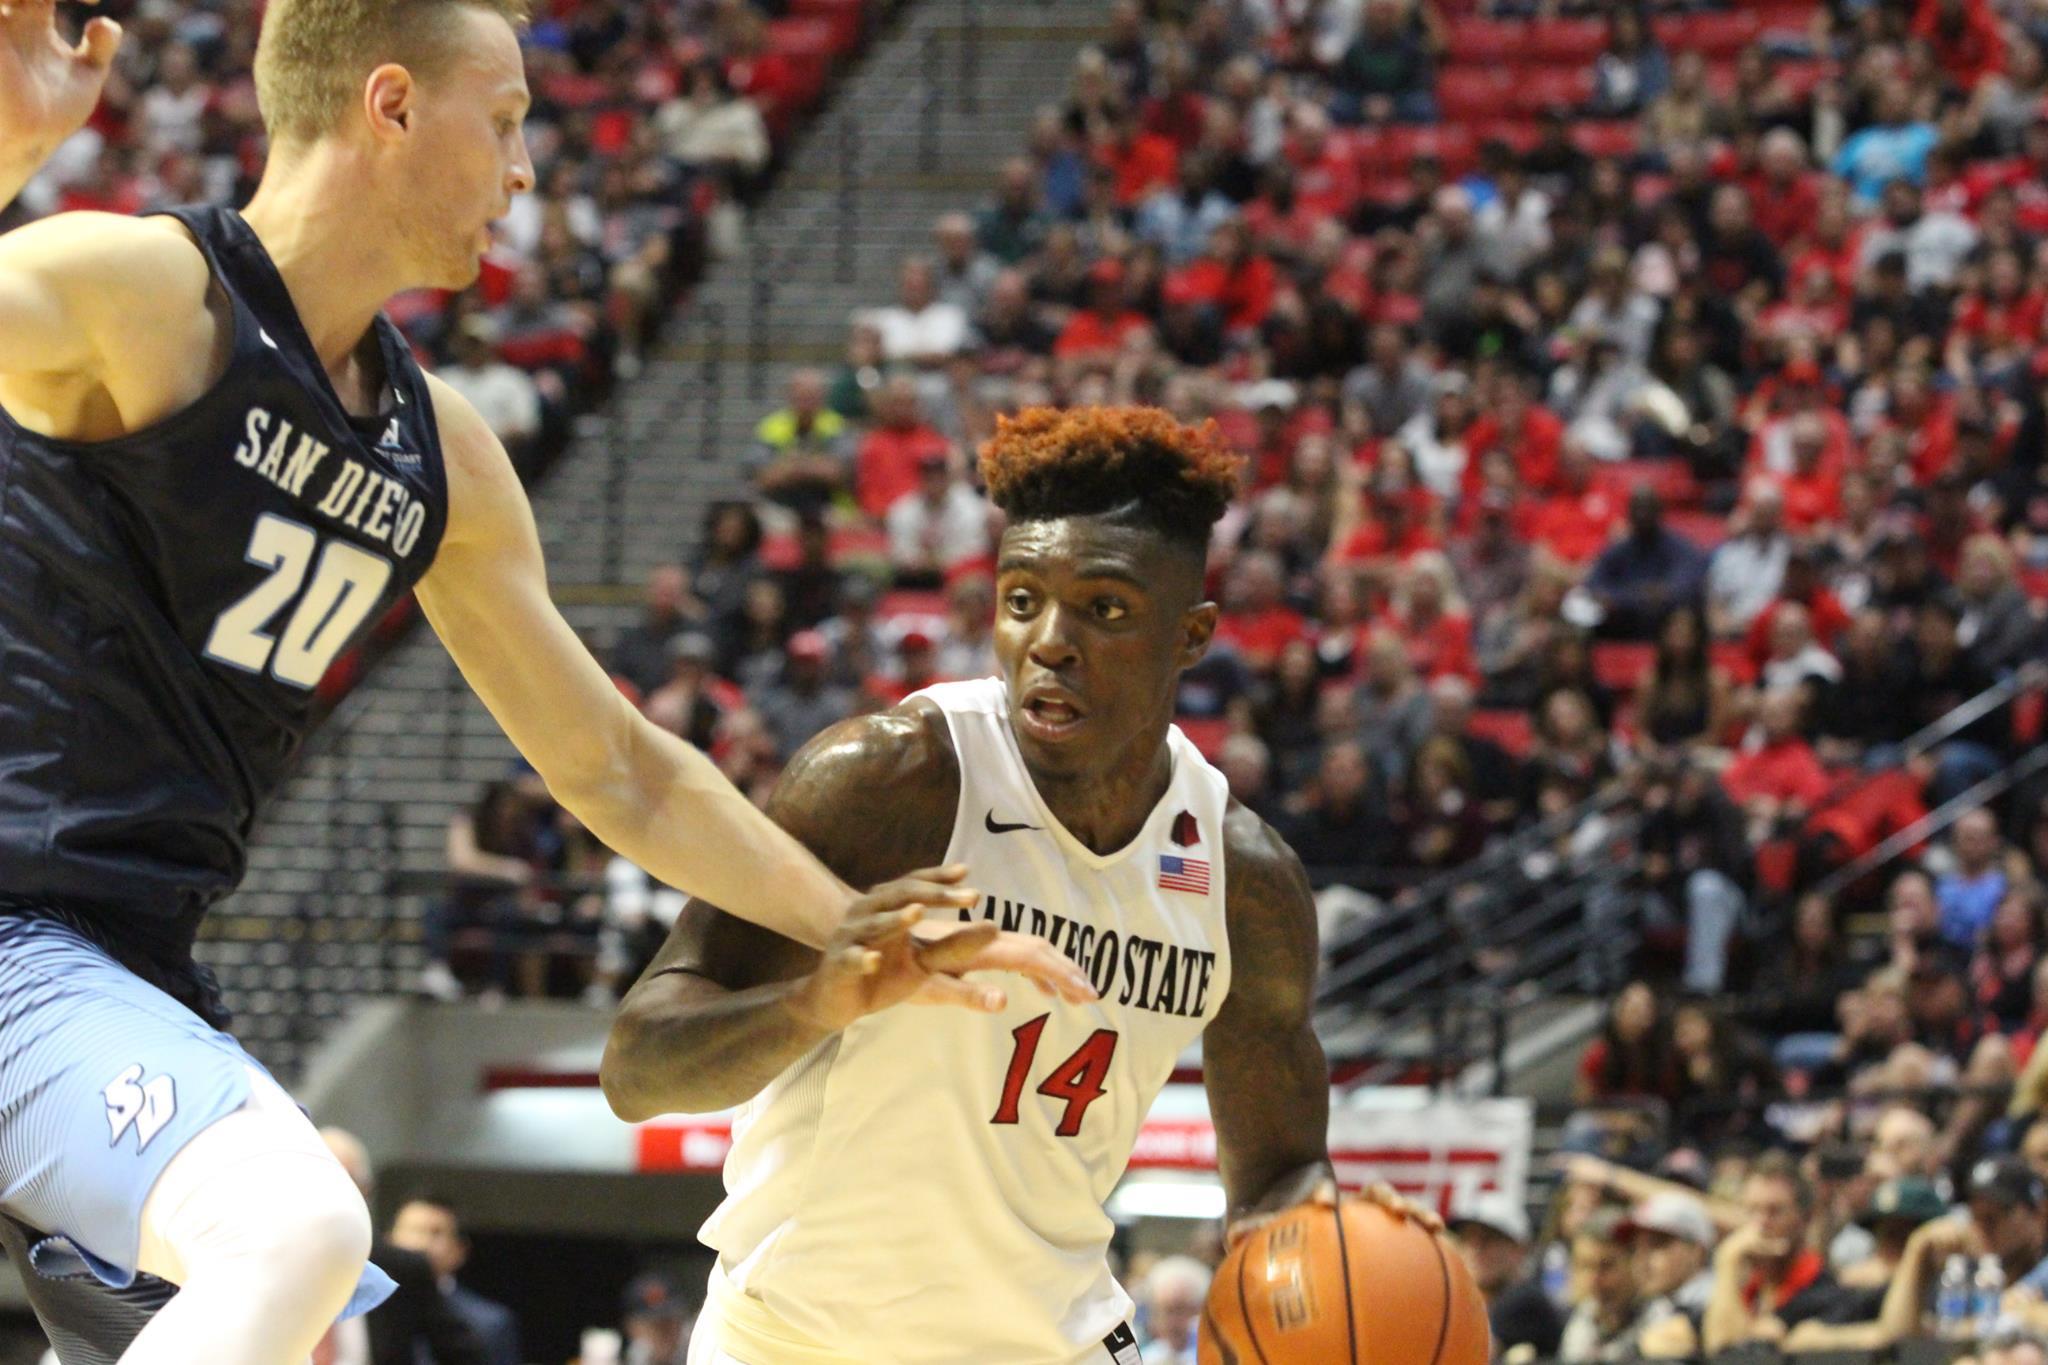 Redshirt sophomore forward Zylan Cheatham attacks the basket against University of San Diego.